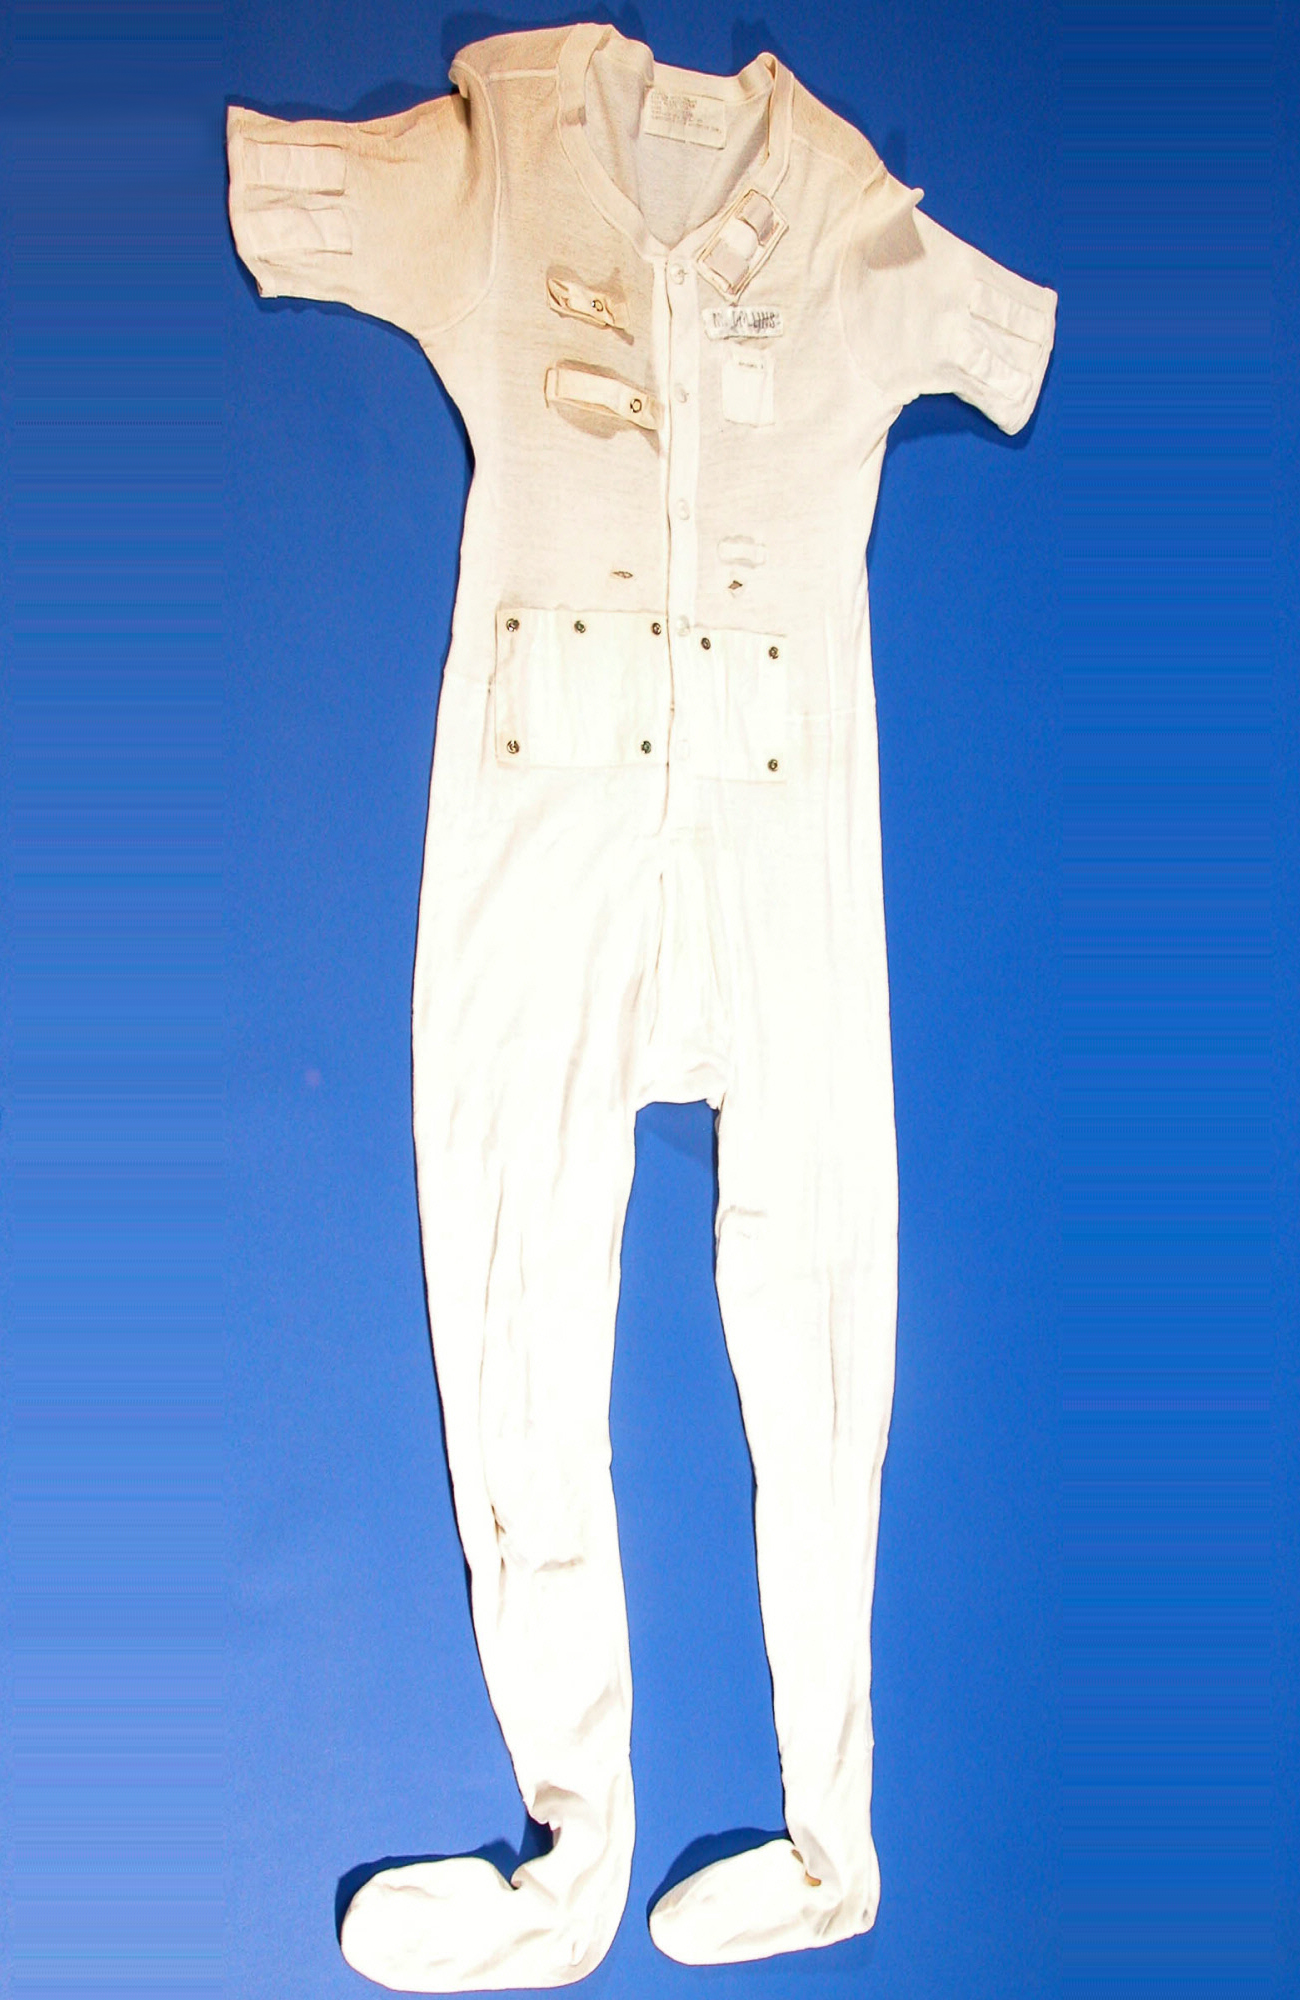 Collins' Constant Wear Garment